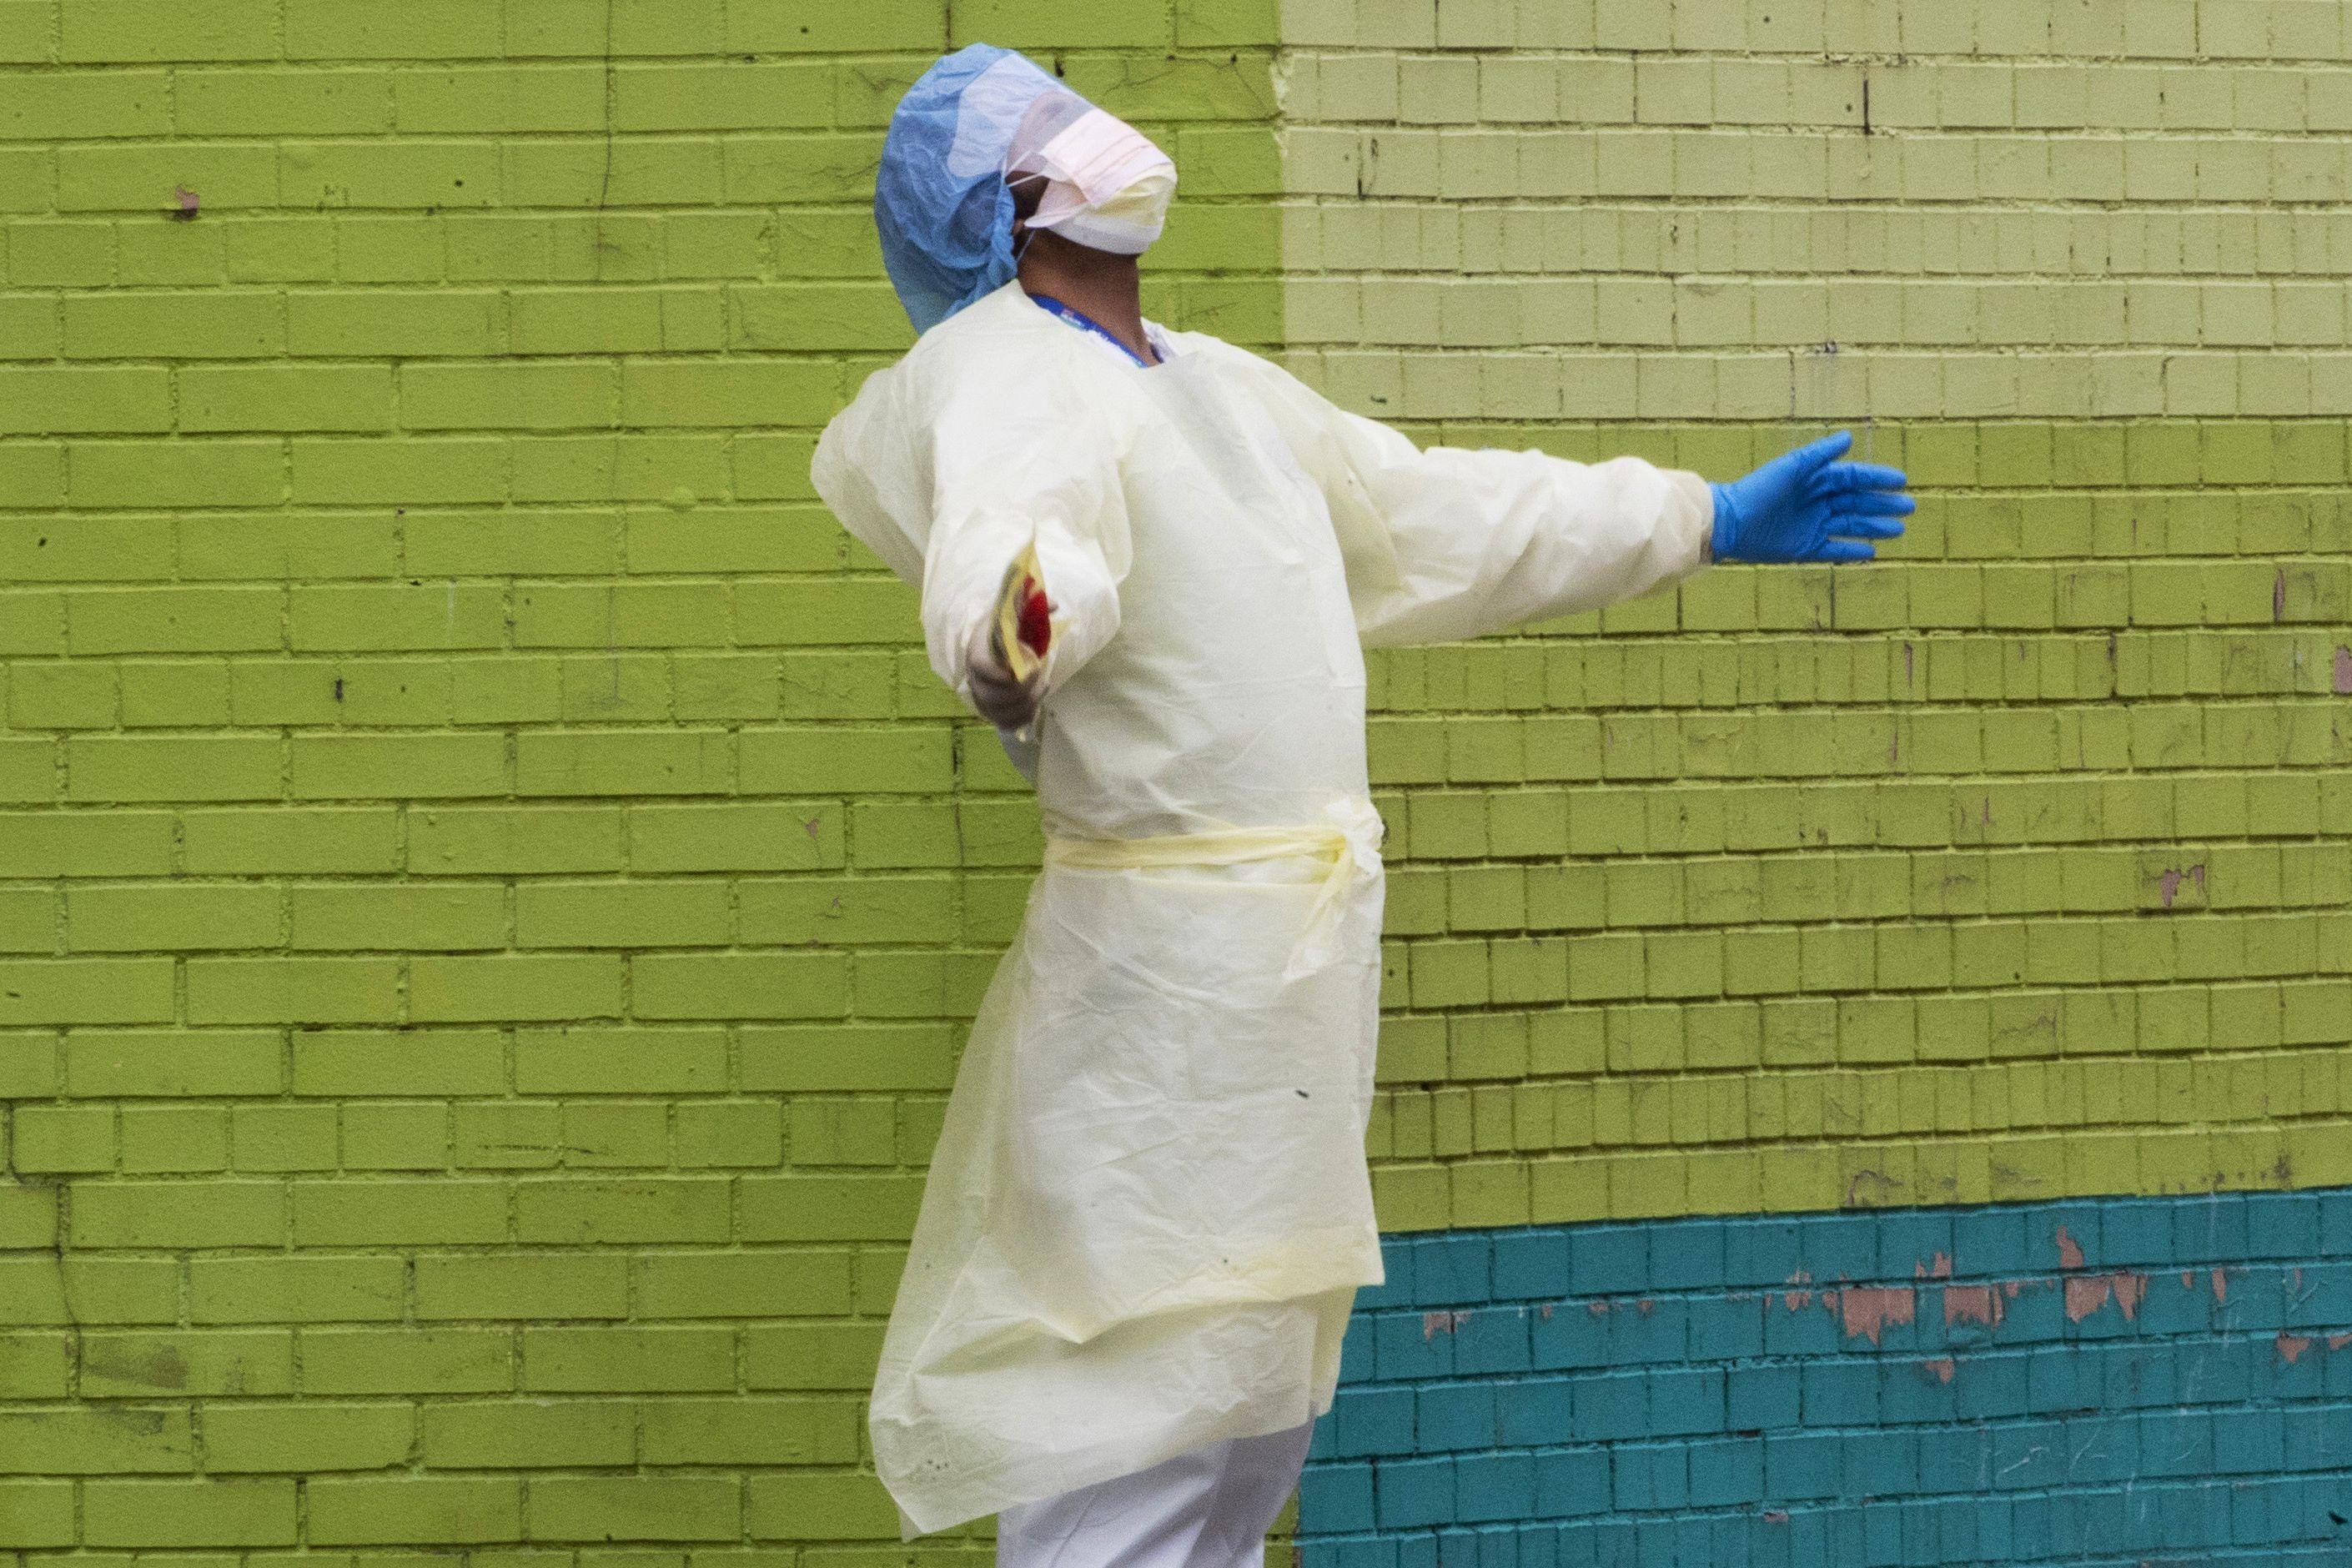 US braces for more coronavirus deaths; Europe hopes crisis peaking